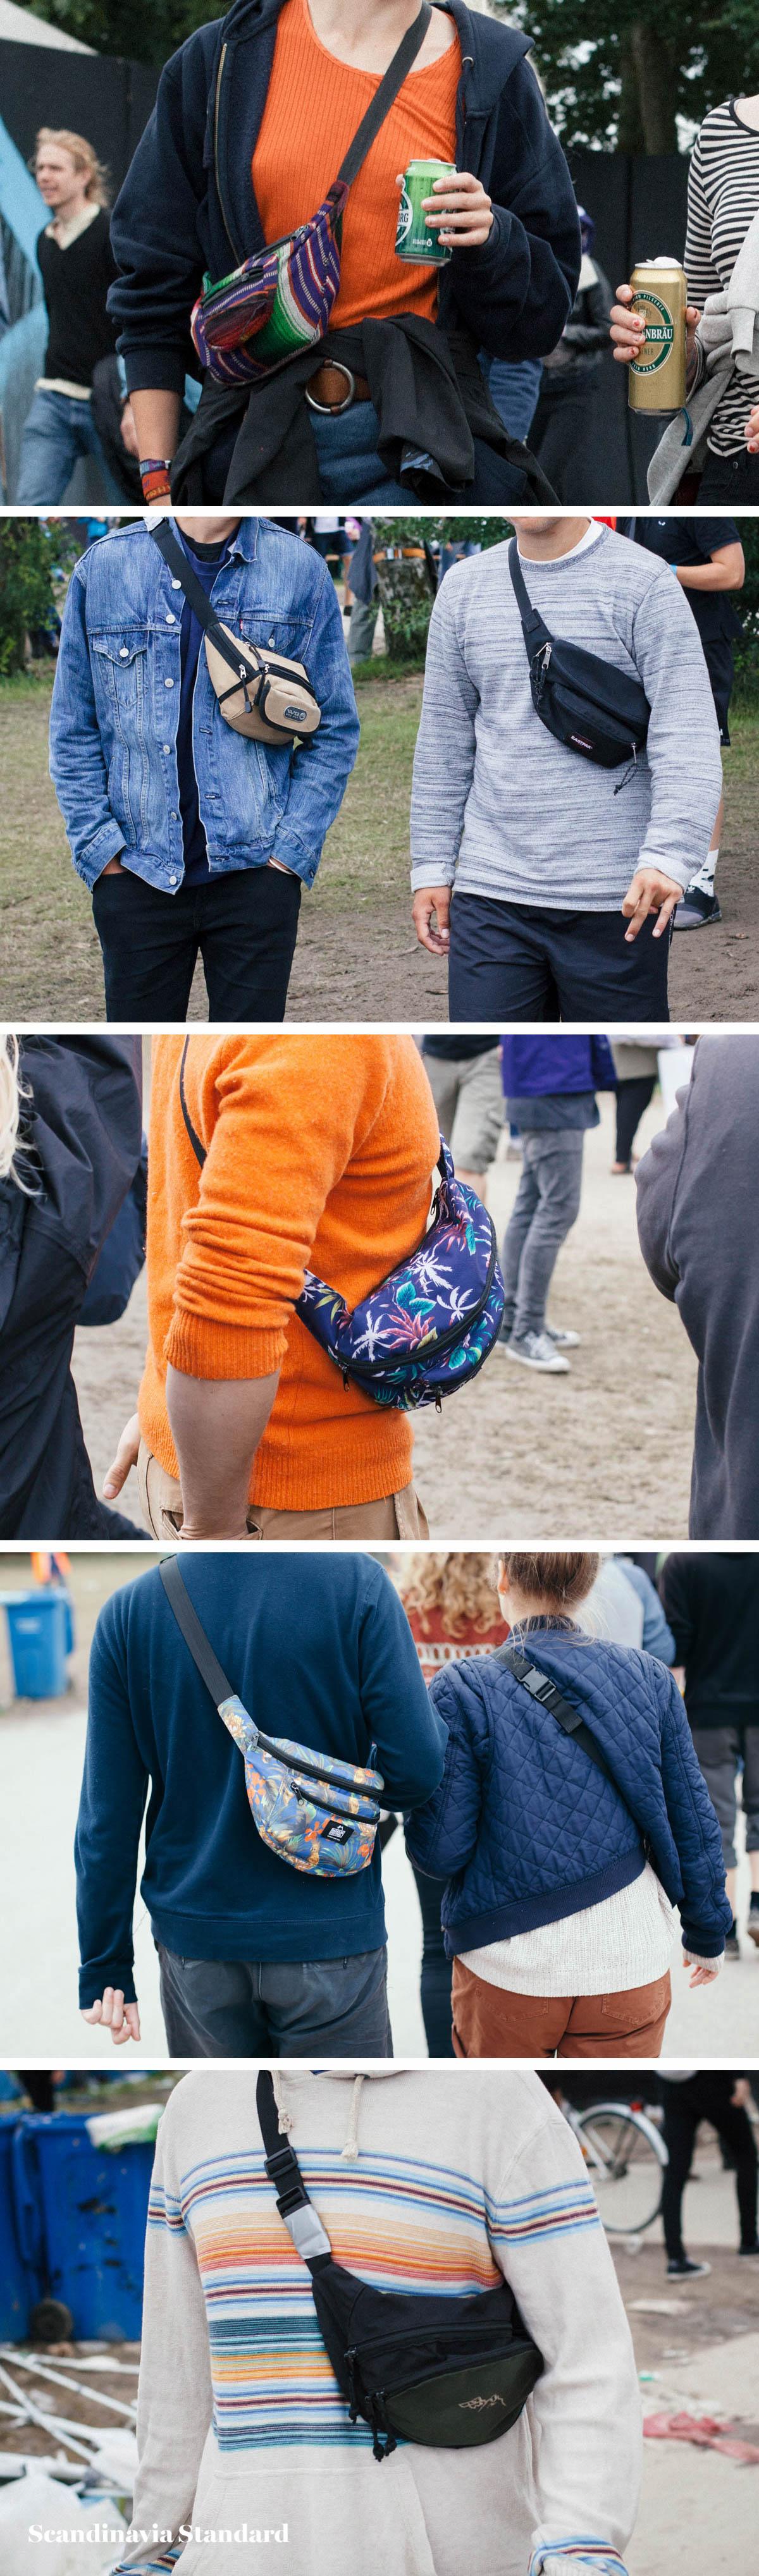 Bum Bags and Fanny Packs - Scandinavia Standard